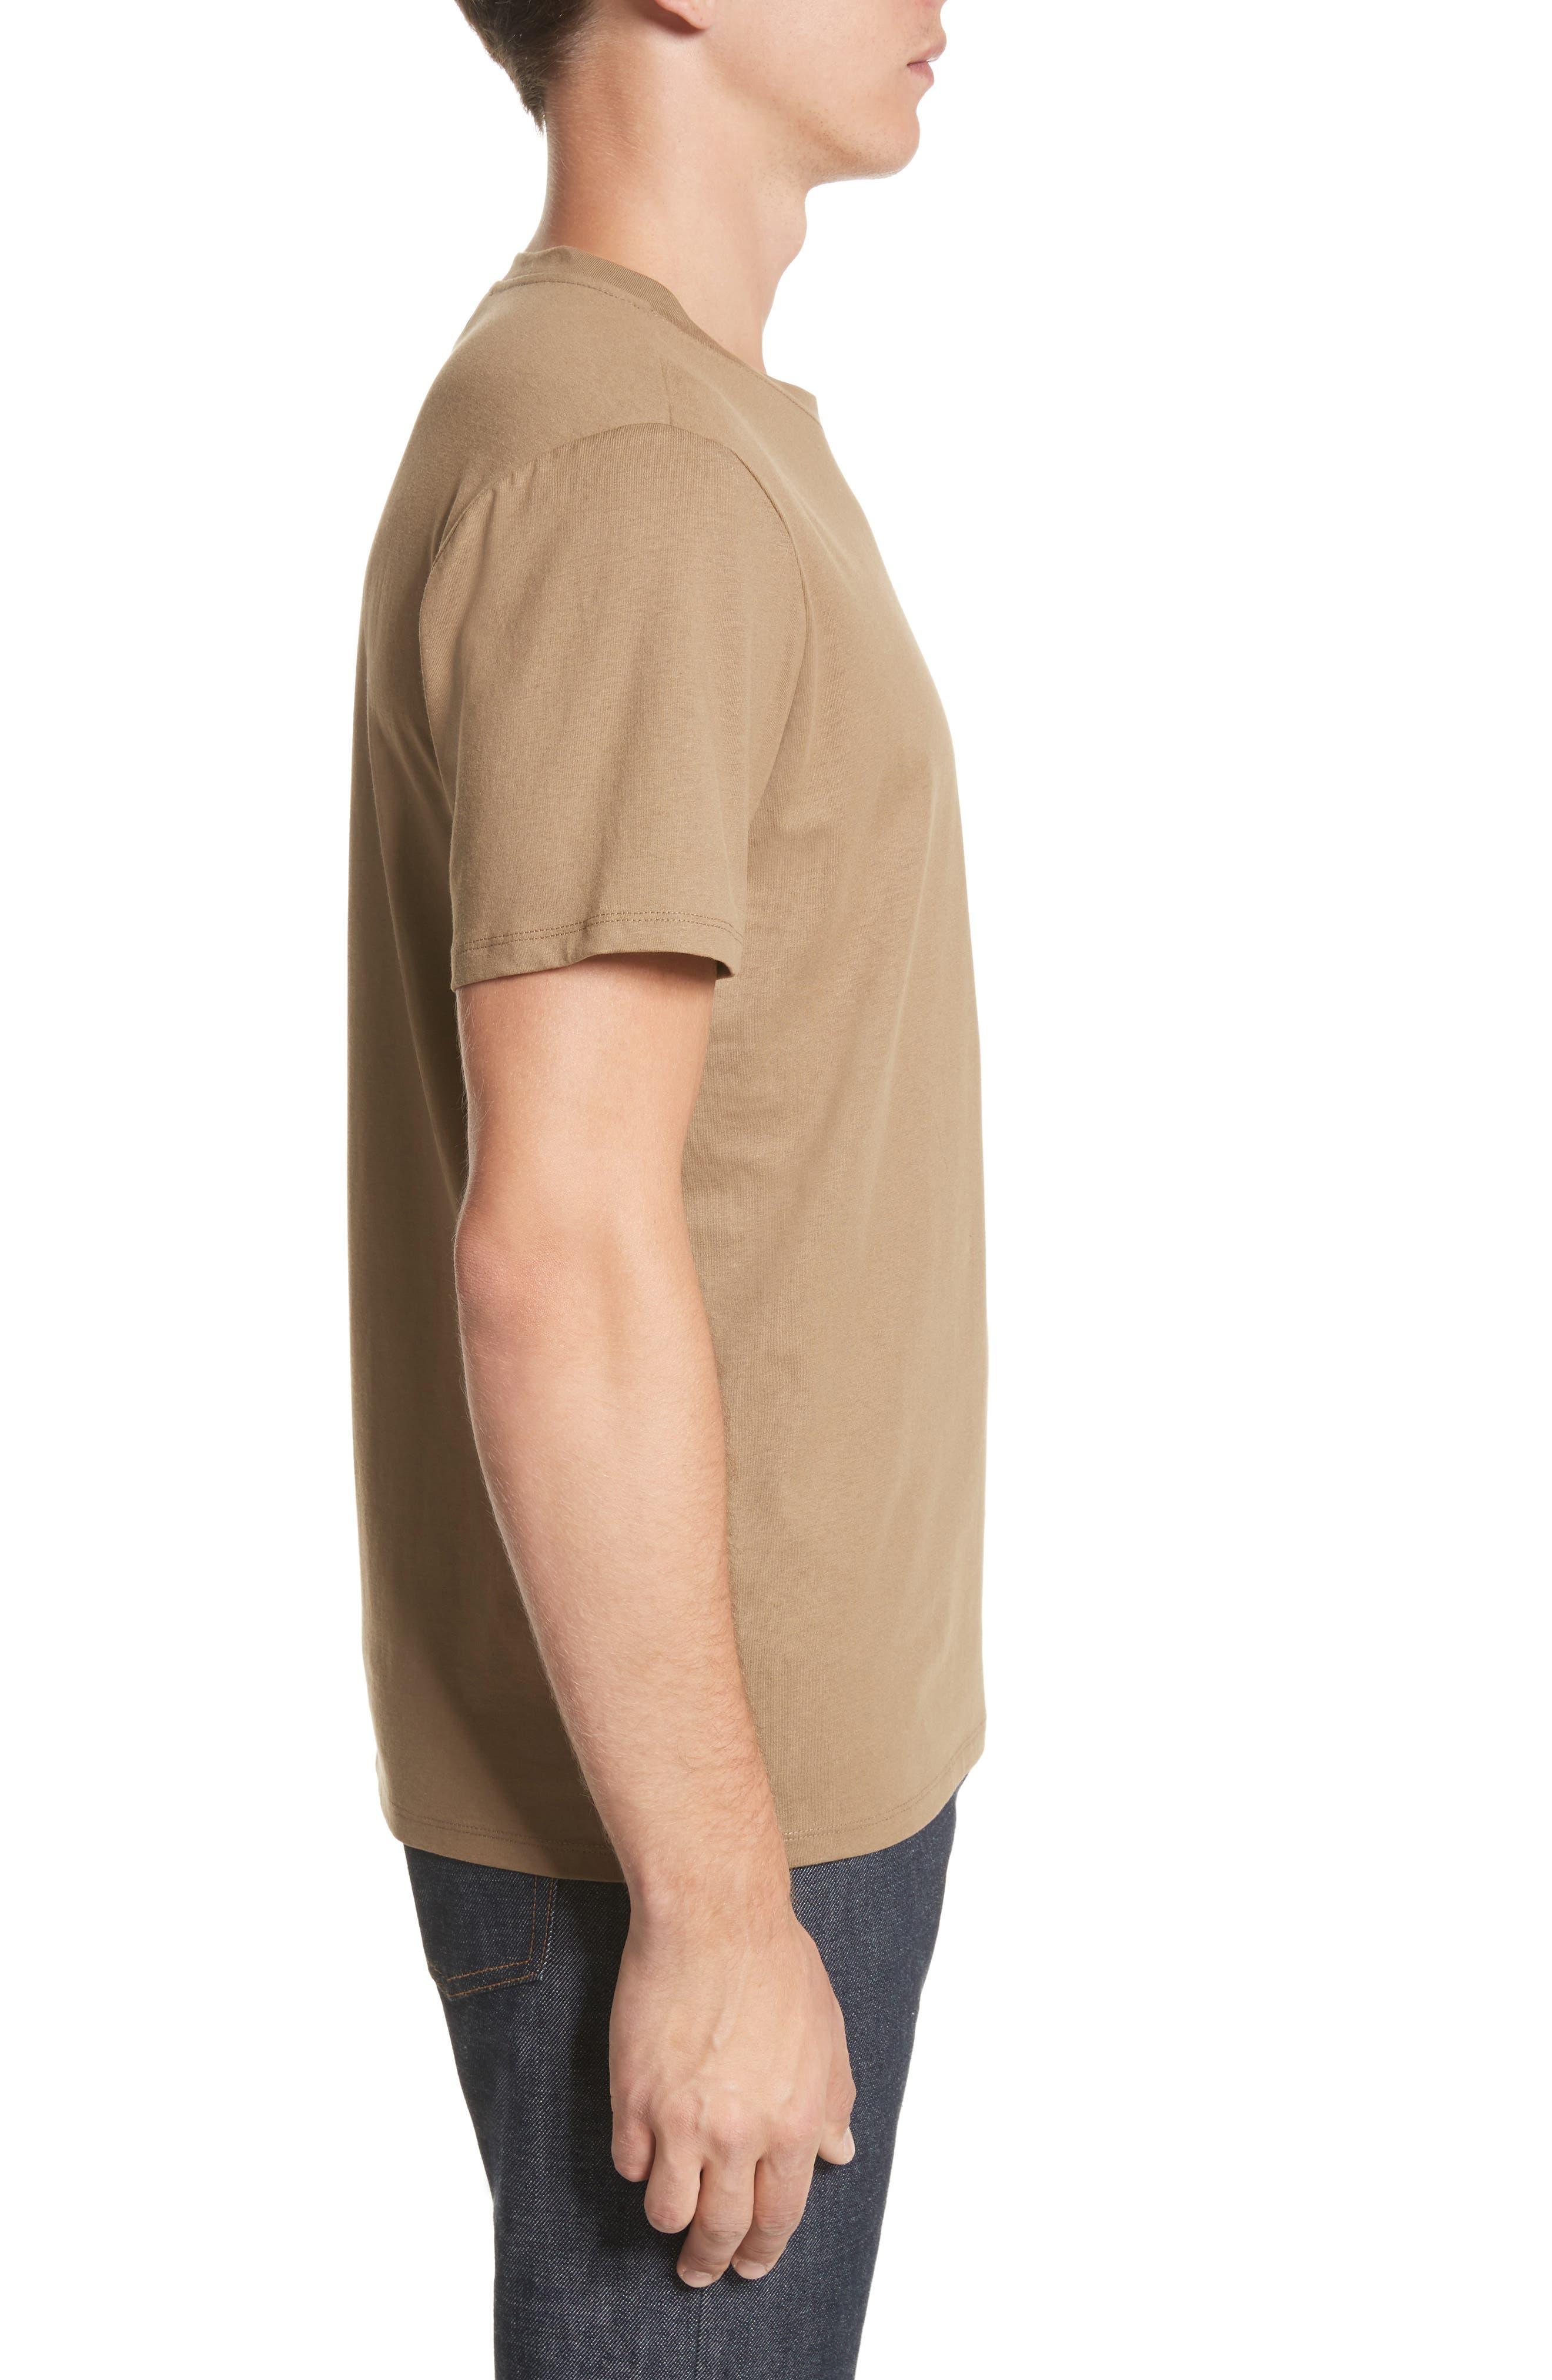 Jimmy T-Shirt,                             Alternate thumbnail 3, color,                             Taupe